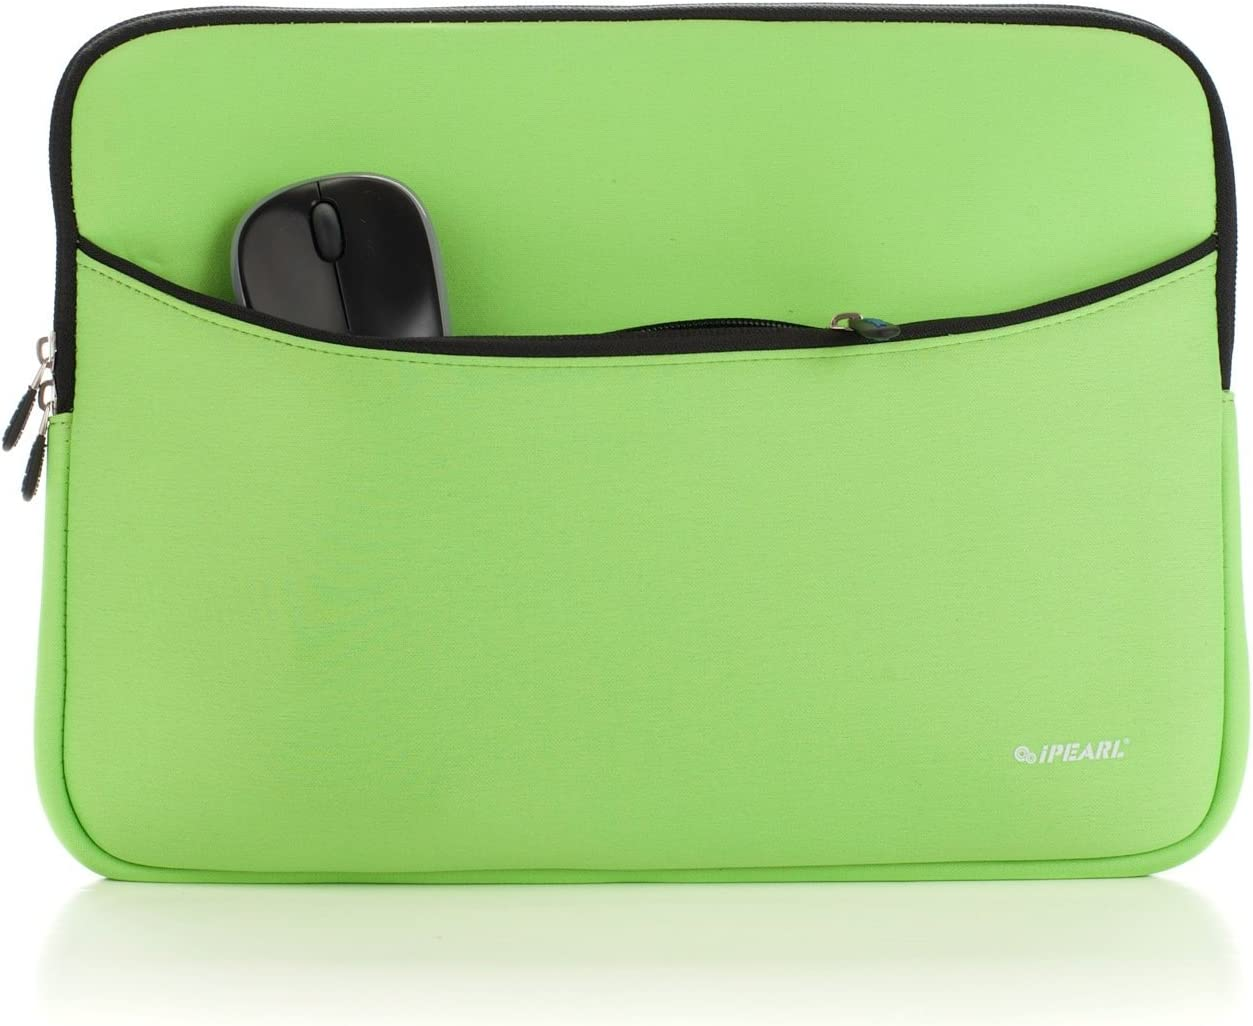 iPearl 14-inch Soft Neoprene Sleeve Case for MacBook & UltraBook Laptop (Built-in External Pocket) (Green)